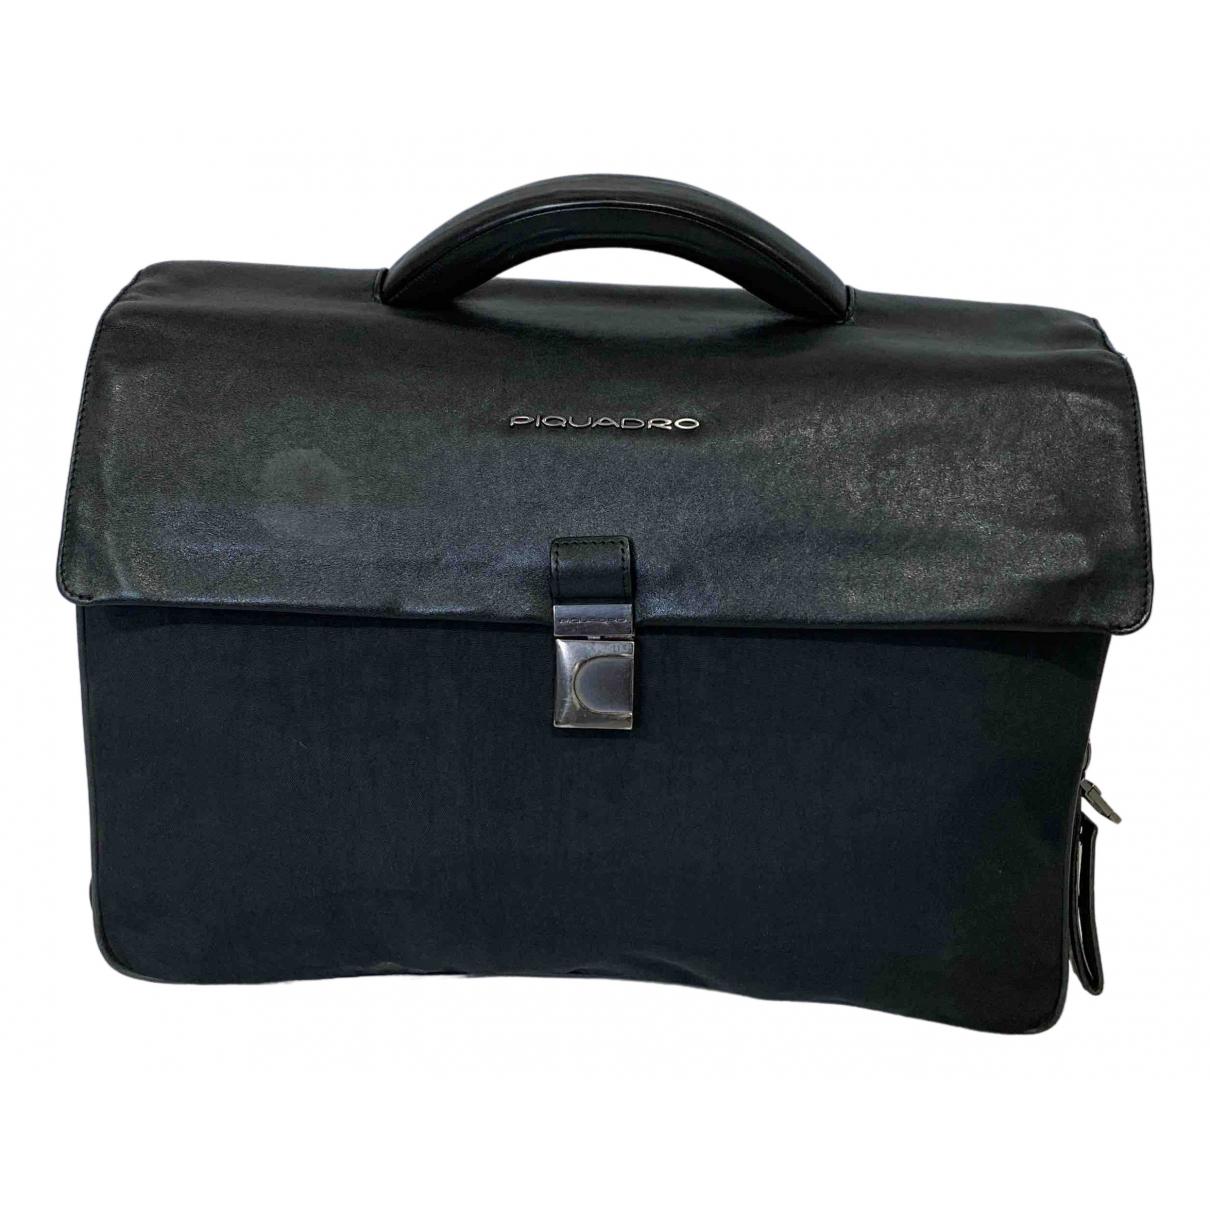 Piquadro \N Black Cloth bag for Men \N